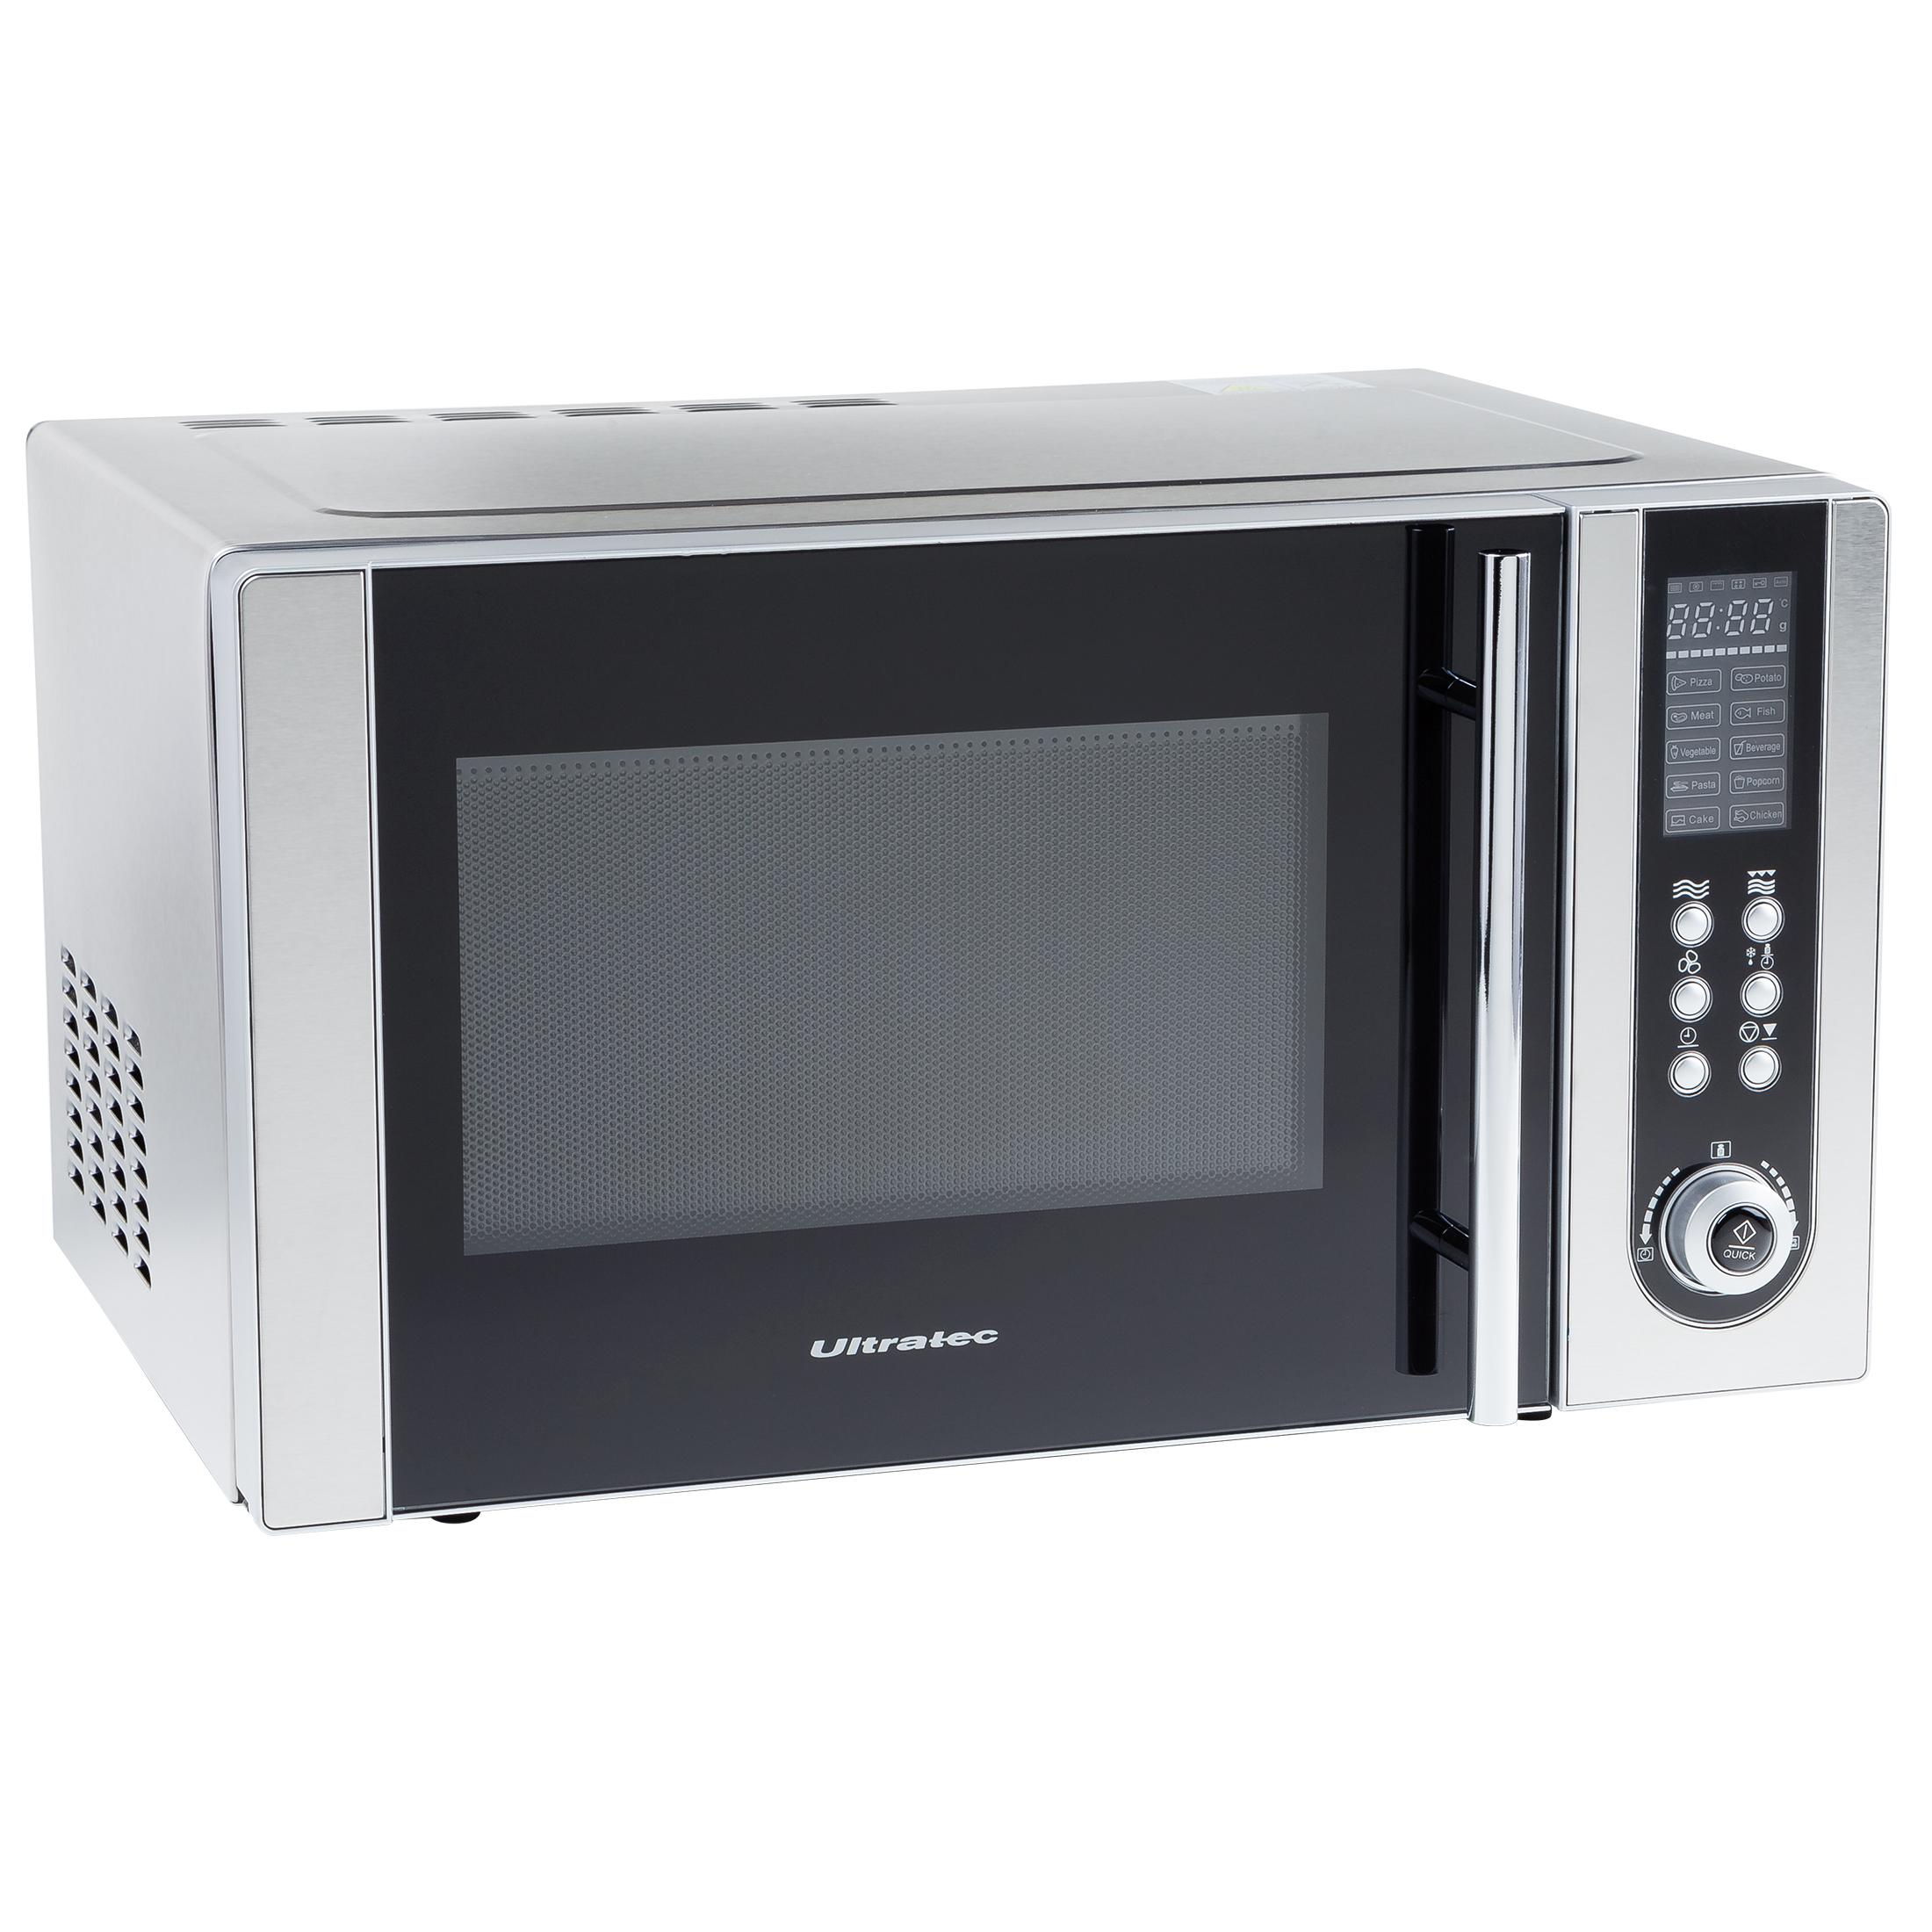 ultratec mikrowelle mwg500 mit grill und umluft 800 1200. Black Bedroom Furniture Sets. Home Design Ideas